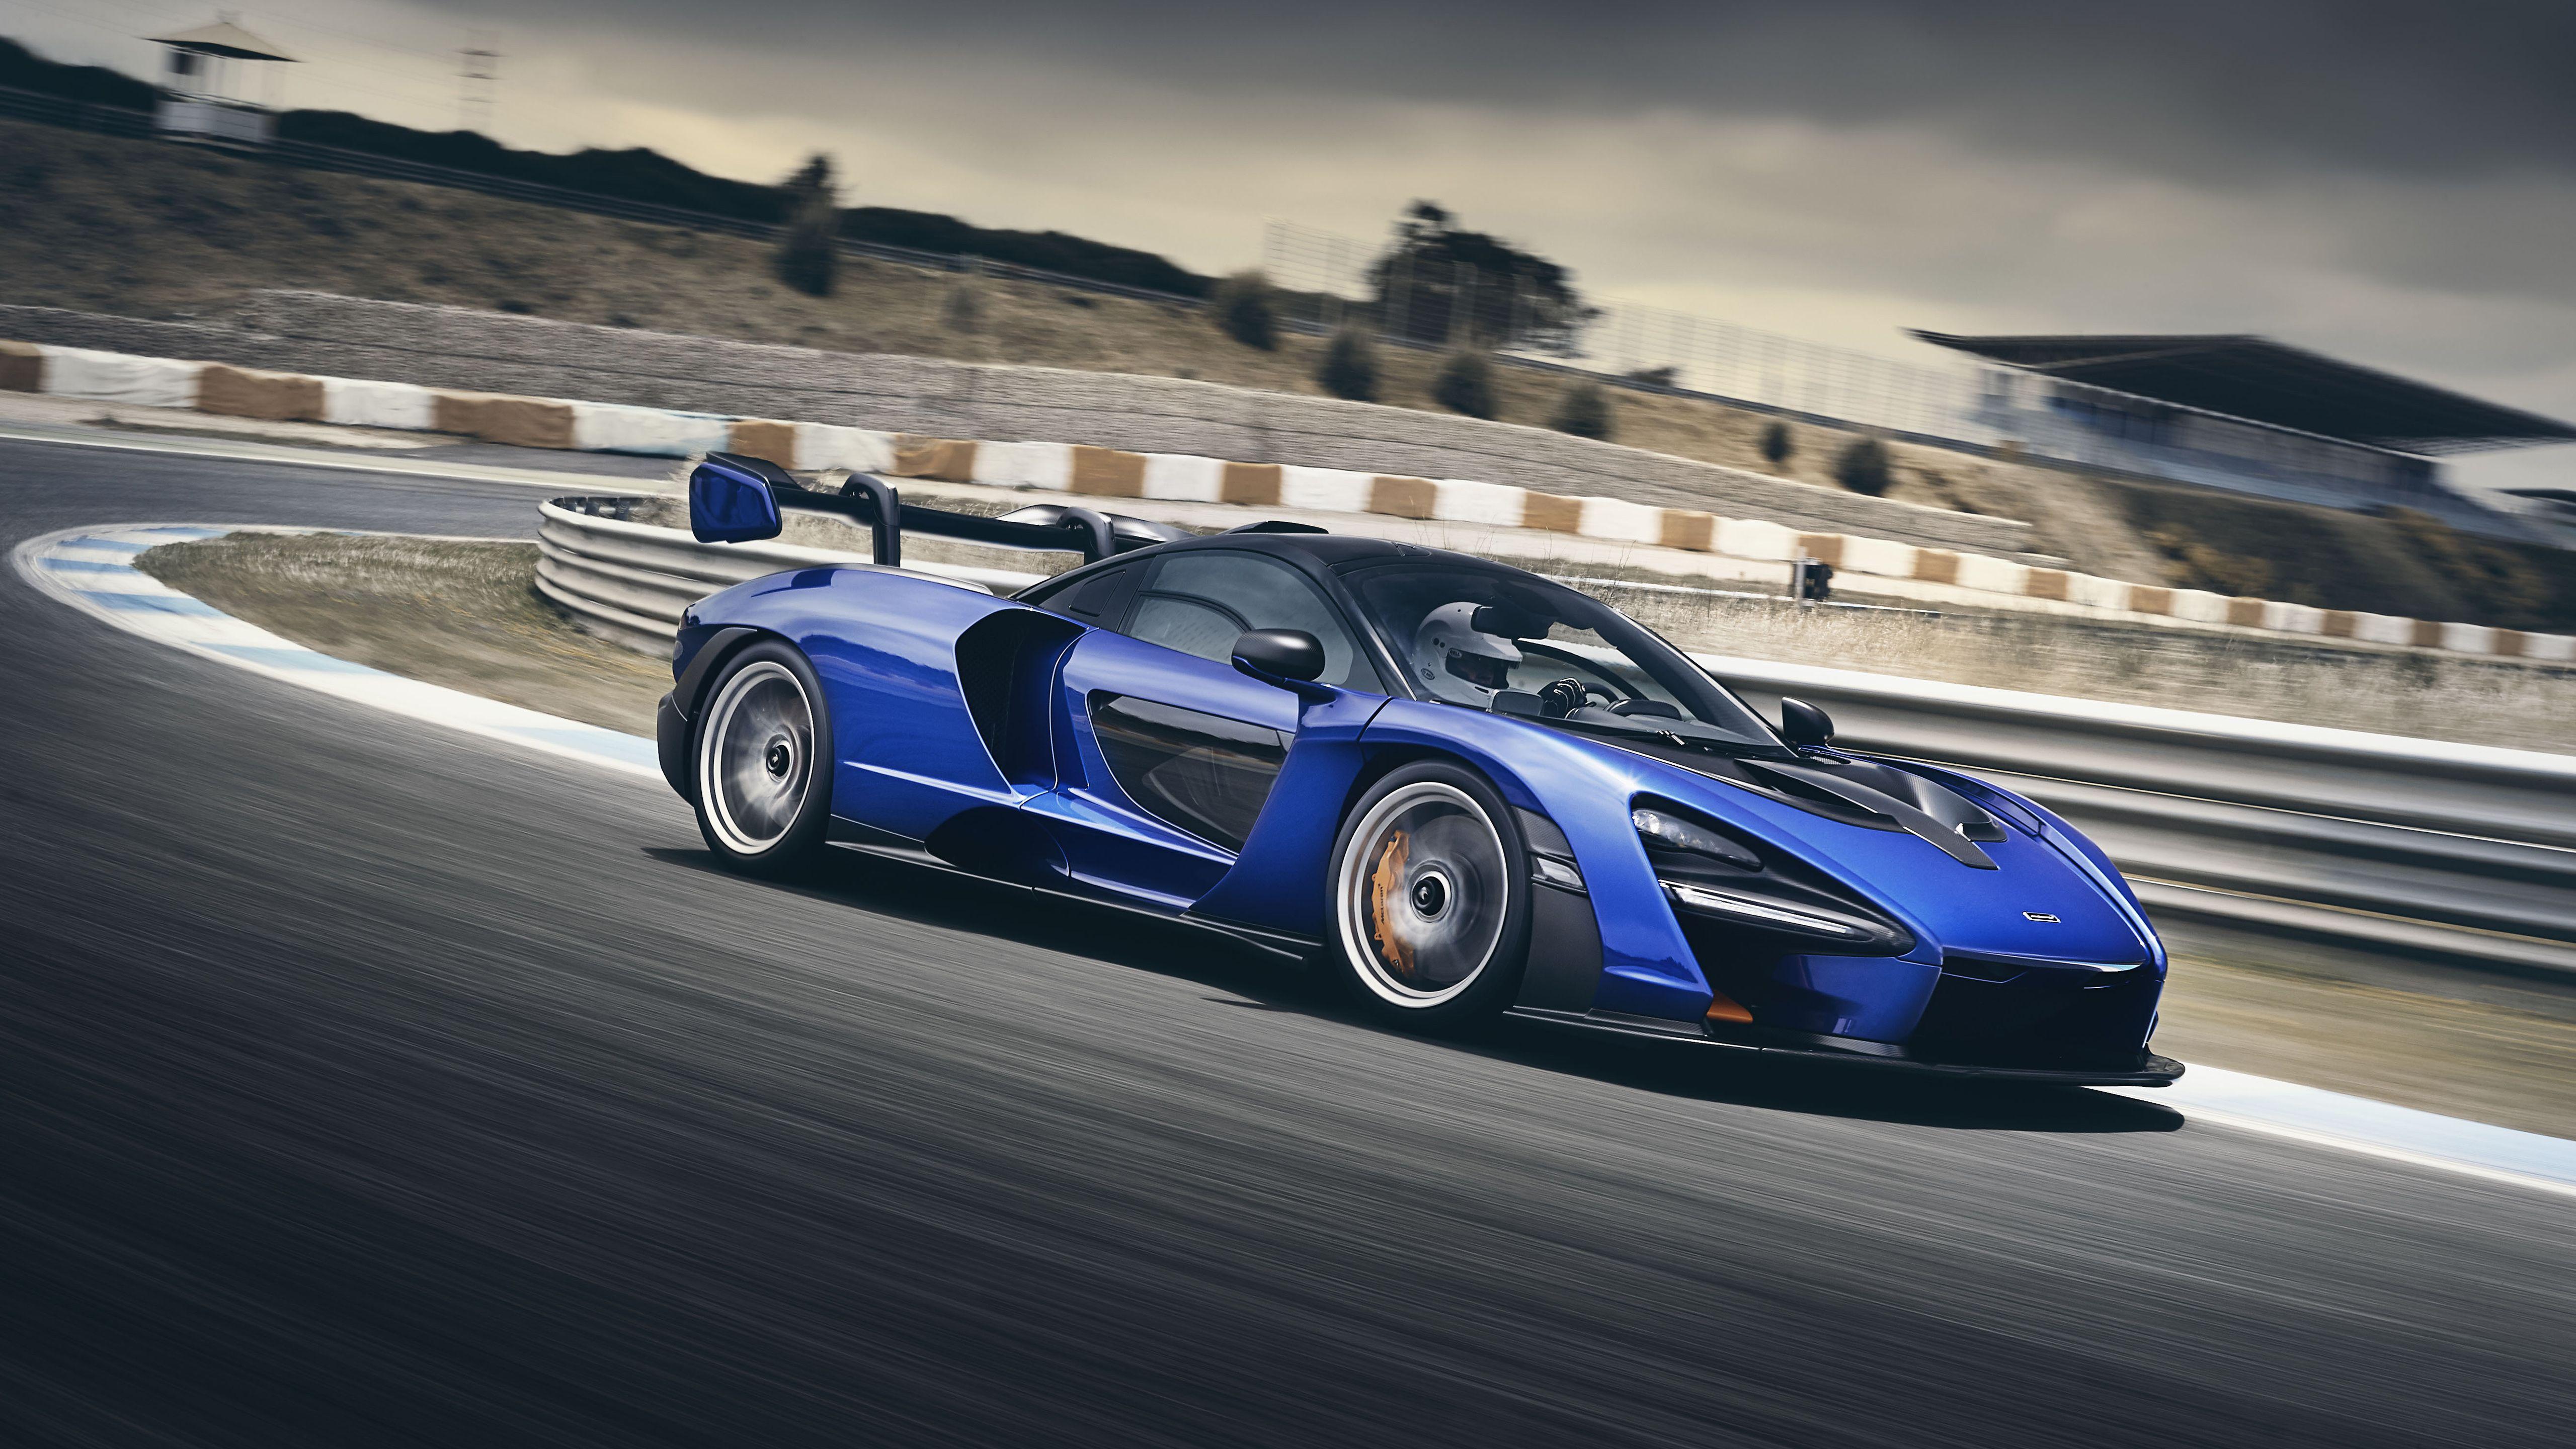 2020 Mclaren Senna Review In 2020 Super Cars Sports Cars Luxury Mclaren